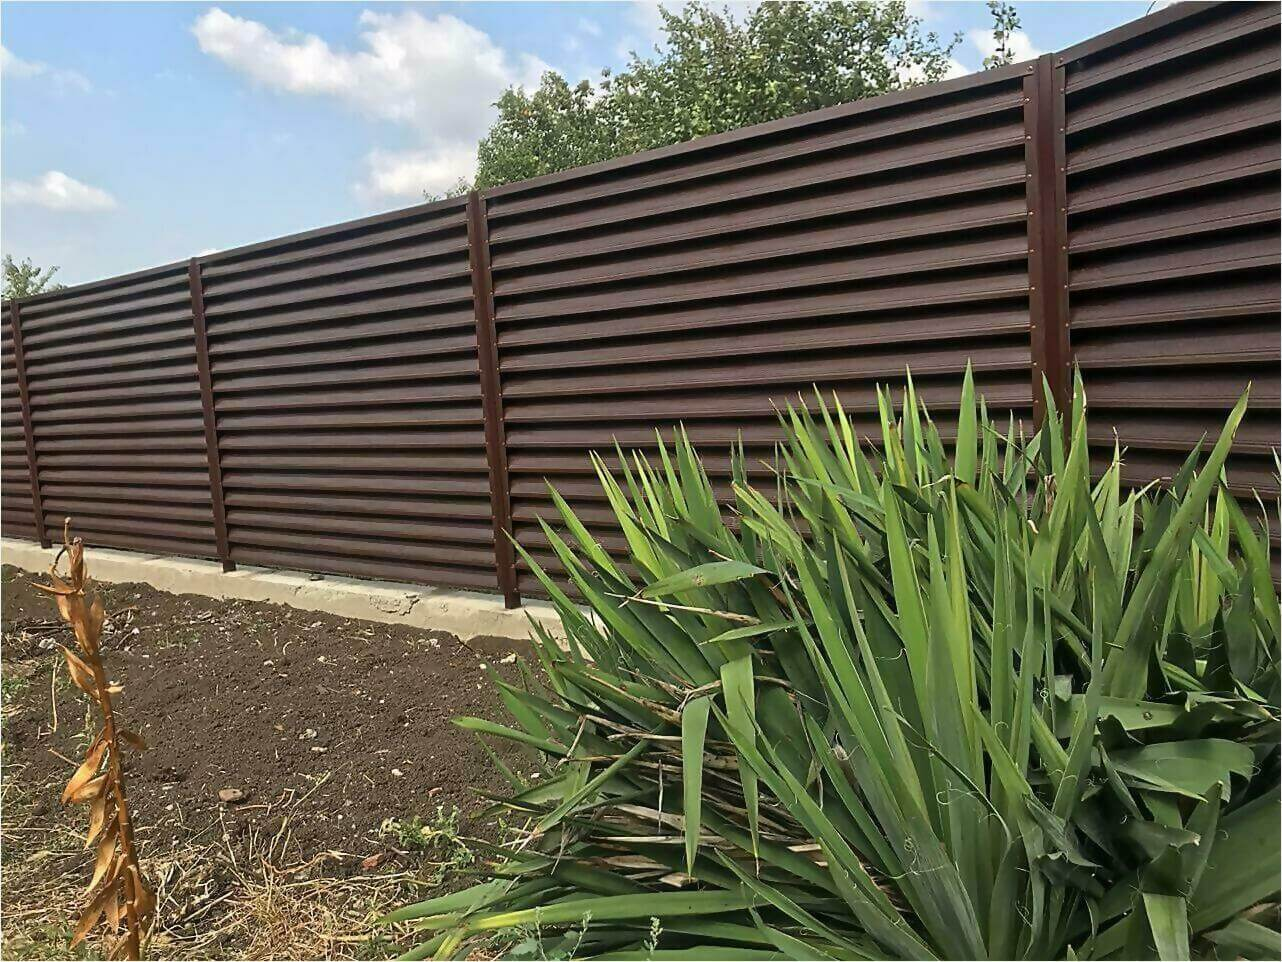 забор жалюзи мореный дуб фото5